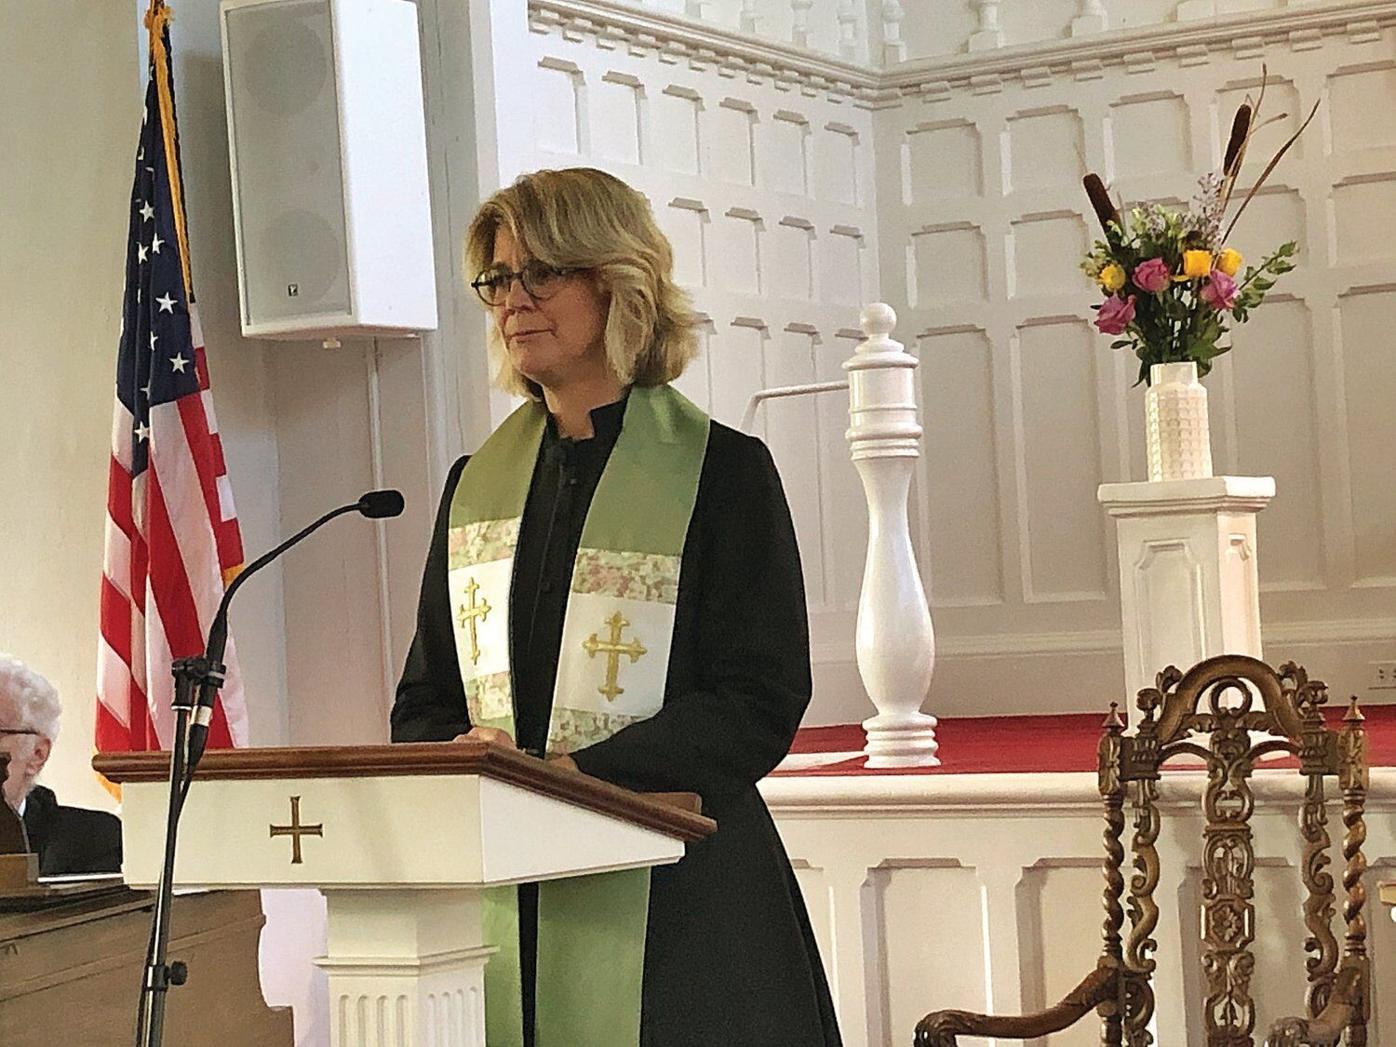 Lenox's oldest church seeks 'viability' in 250th year amid 'really hard' change